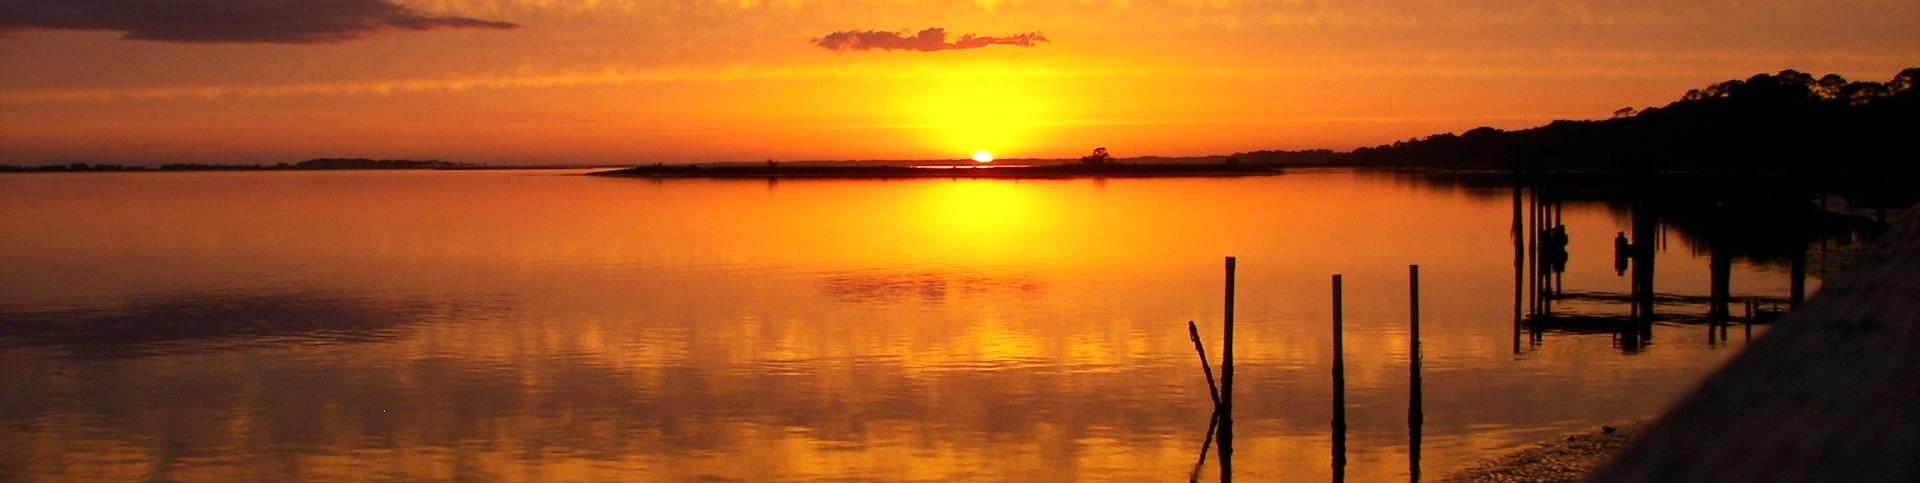 Sunset on Alligator Point Harbor